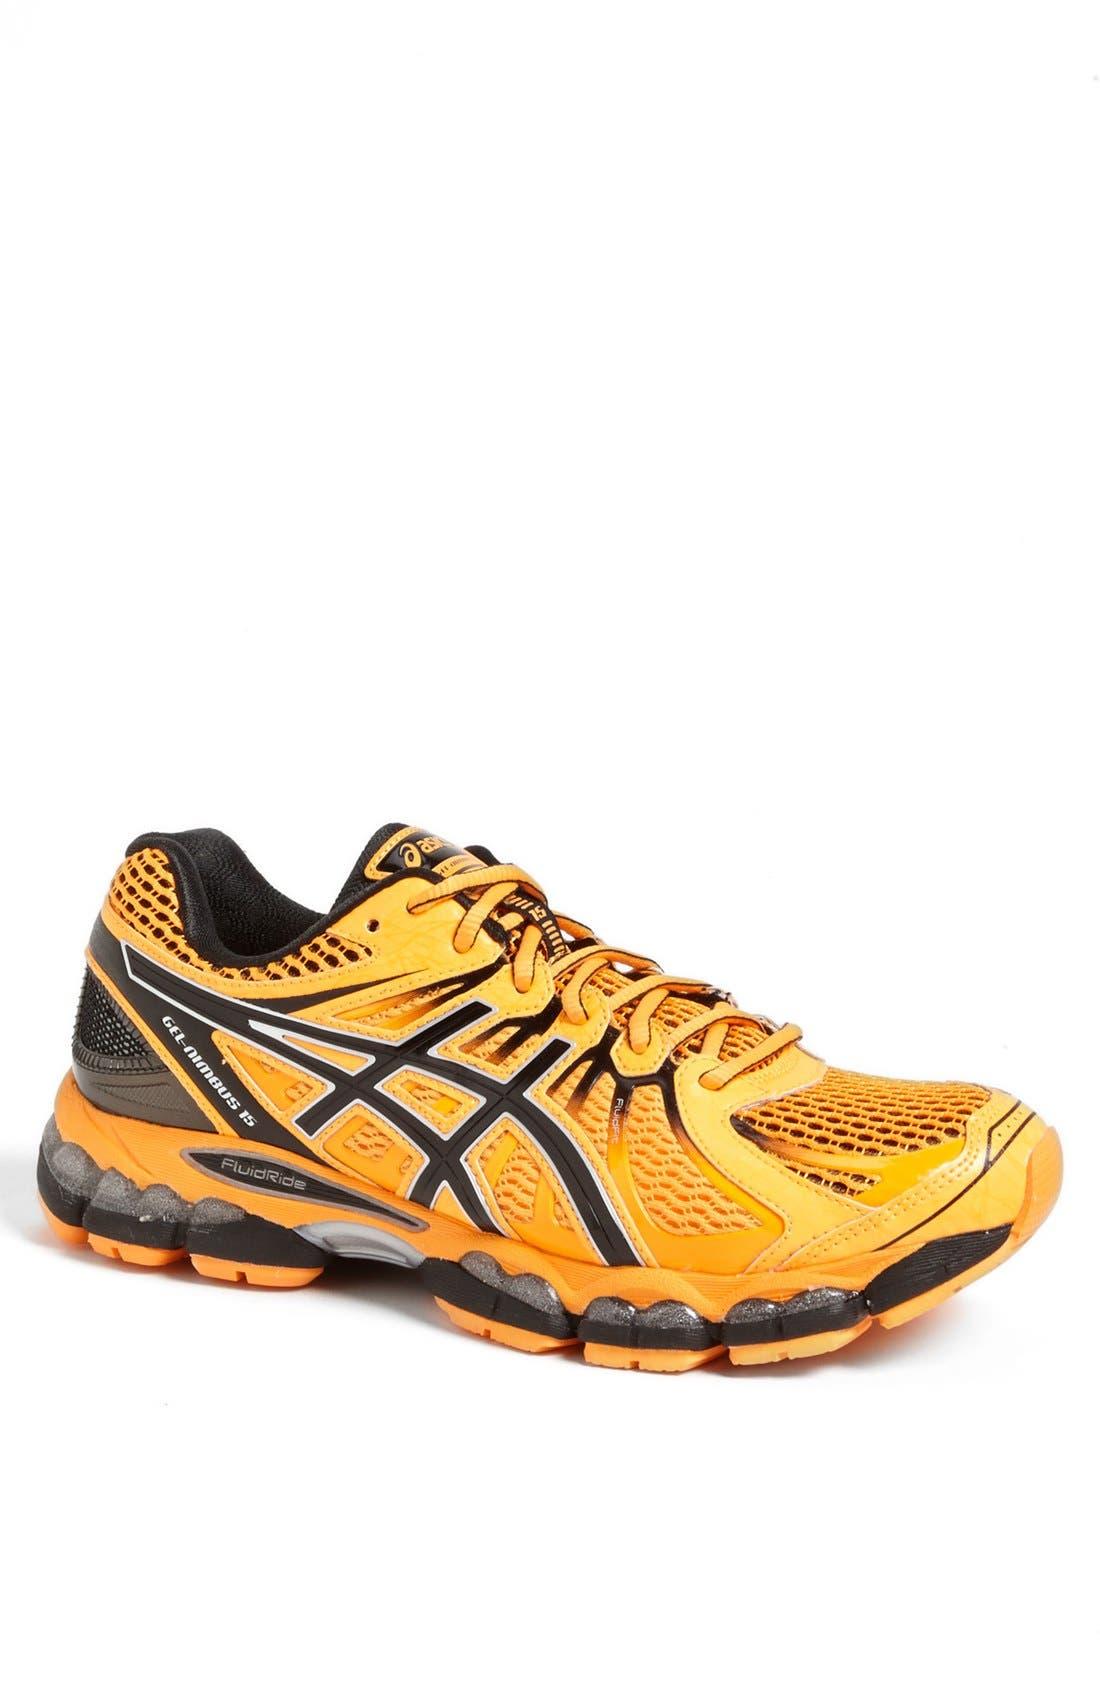 Alternate Image 1 Selected - ASICS® 'GEL-Nimbus 15' Running Shoe (Men)